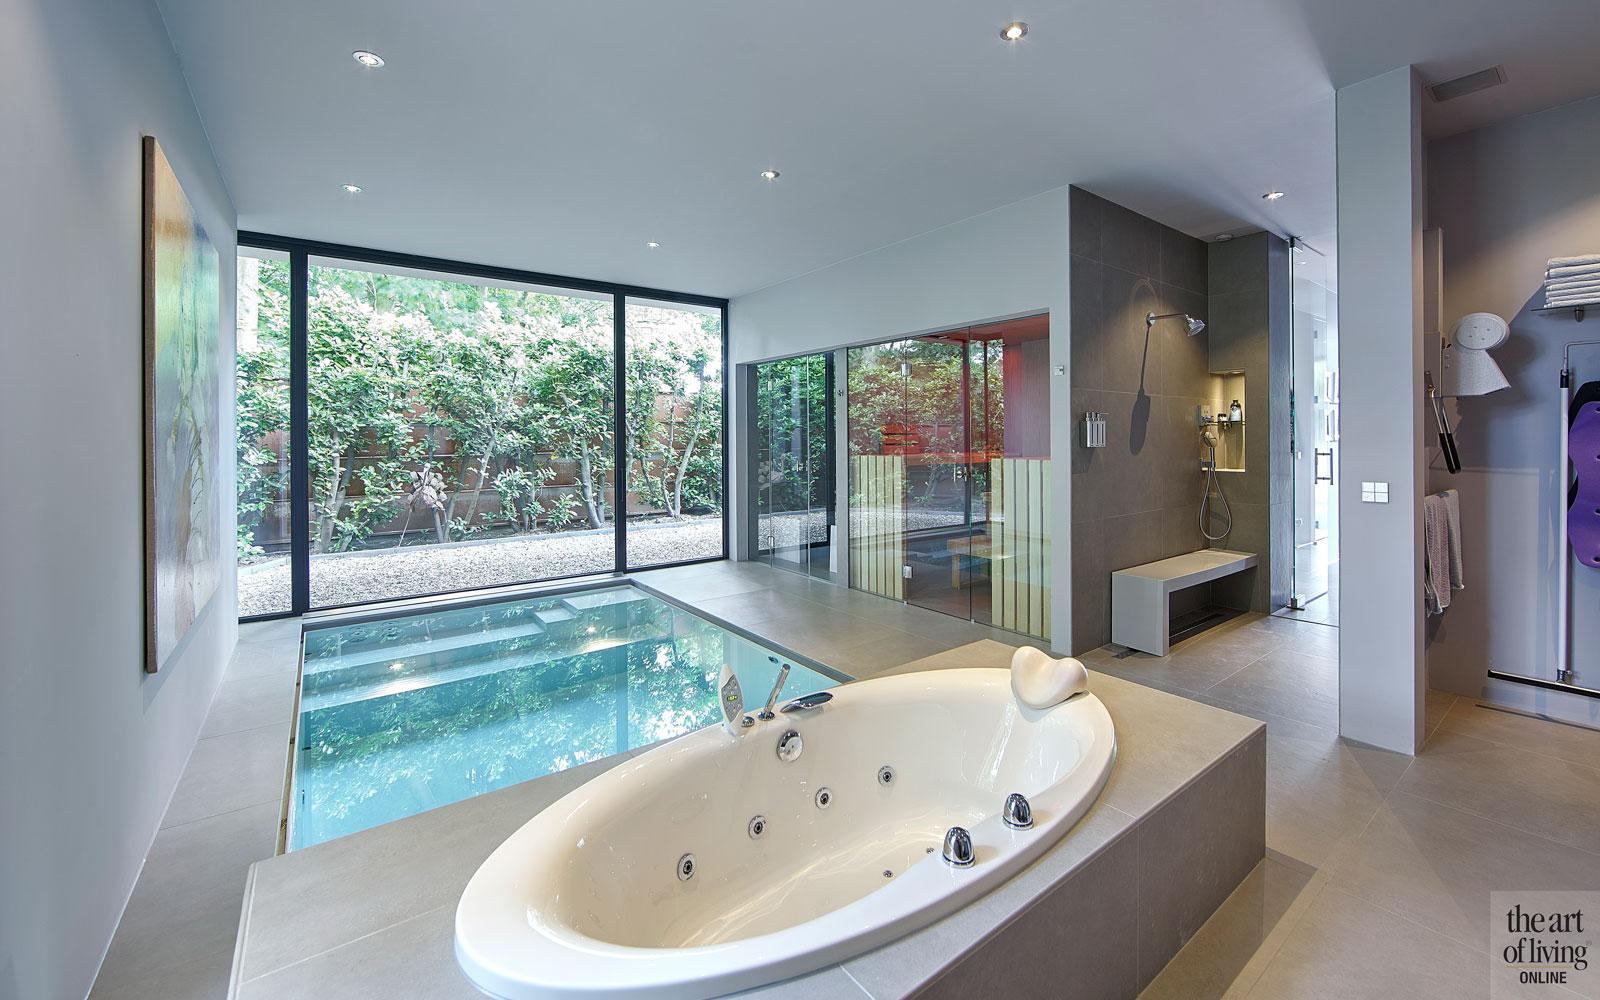 Zwembad, Zwembaden, Pool ,Pools, bad, Wellness, Moderne villa, Boley, The Art of Living